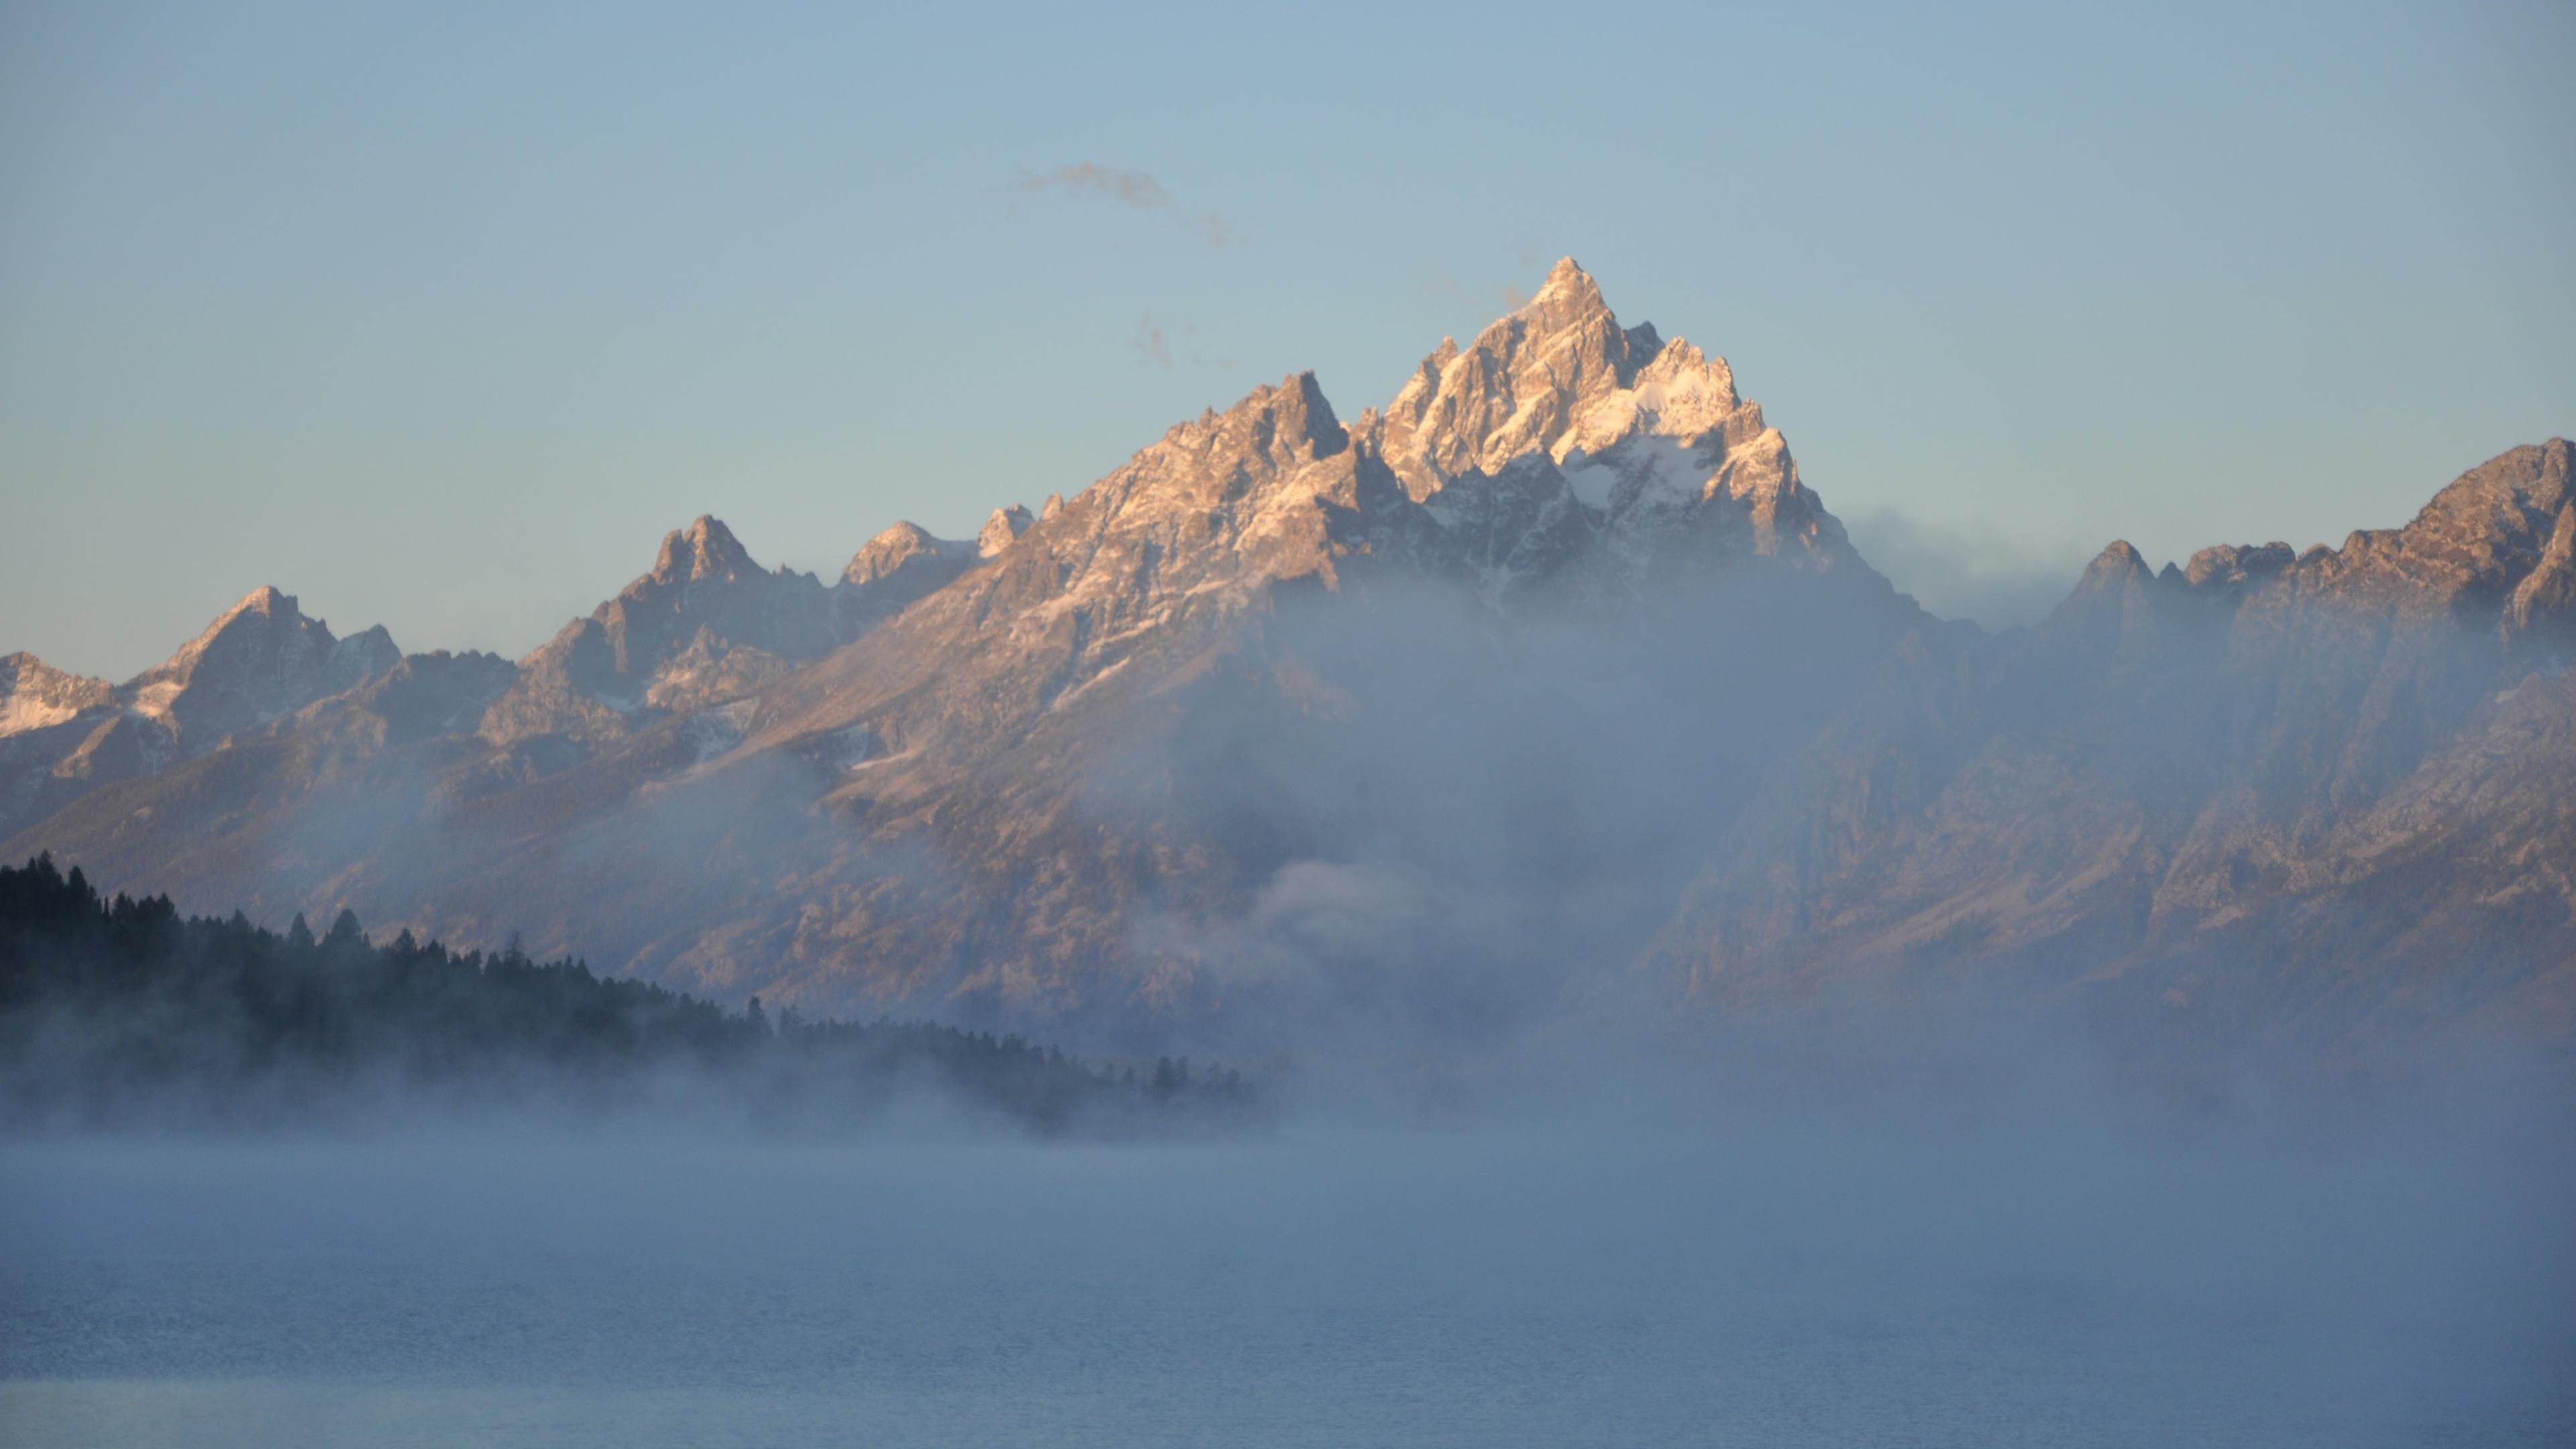 3840x2160 Grand Teton National Park Wyoming 4k Wallpaper Hd